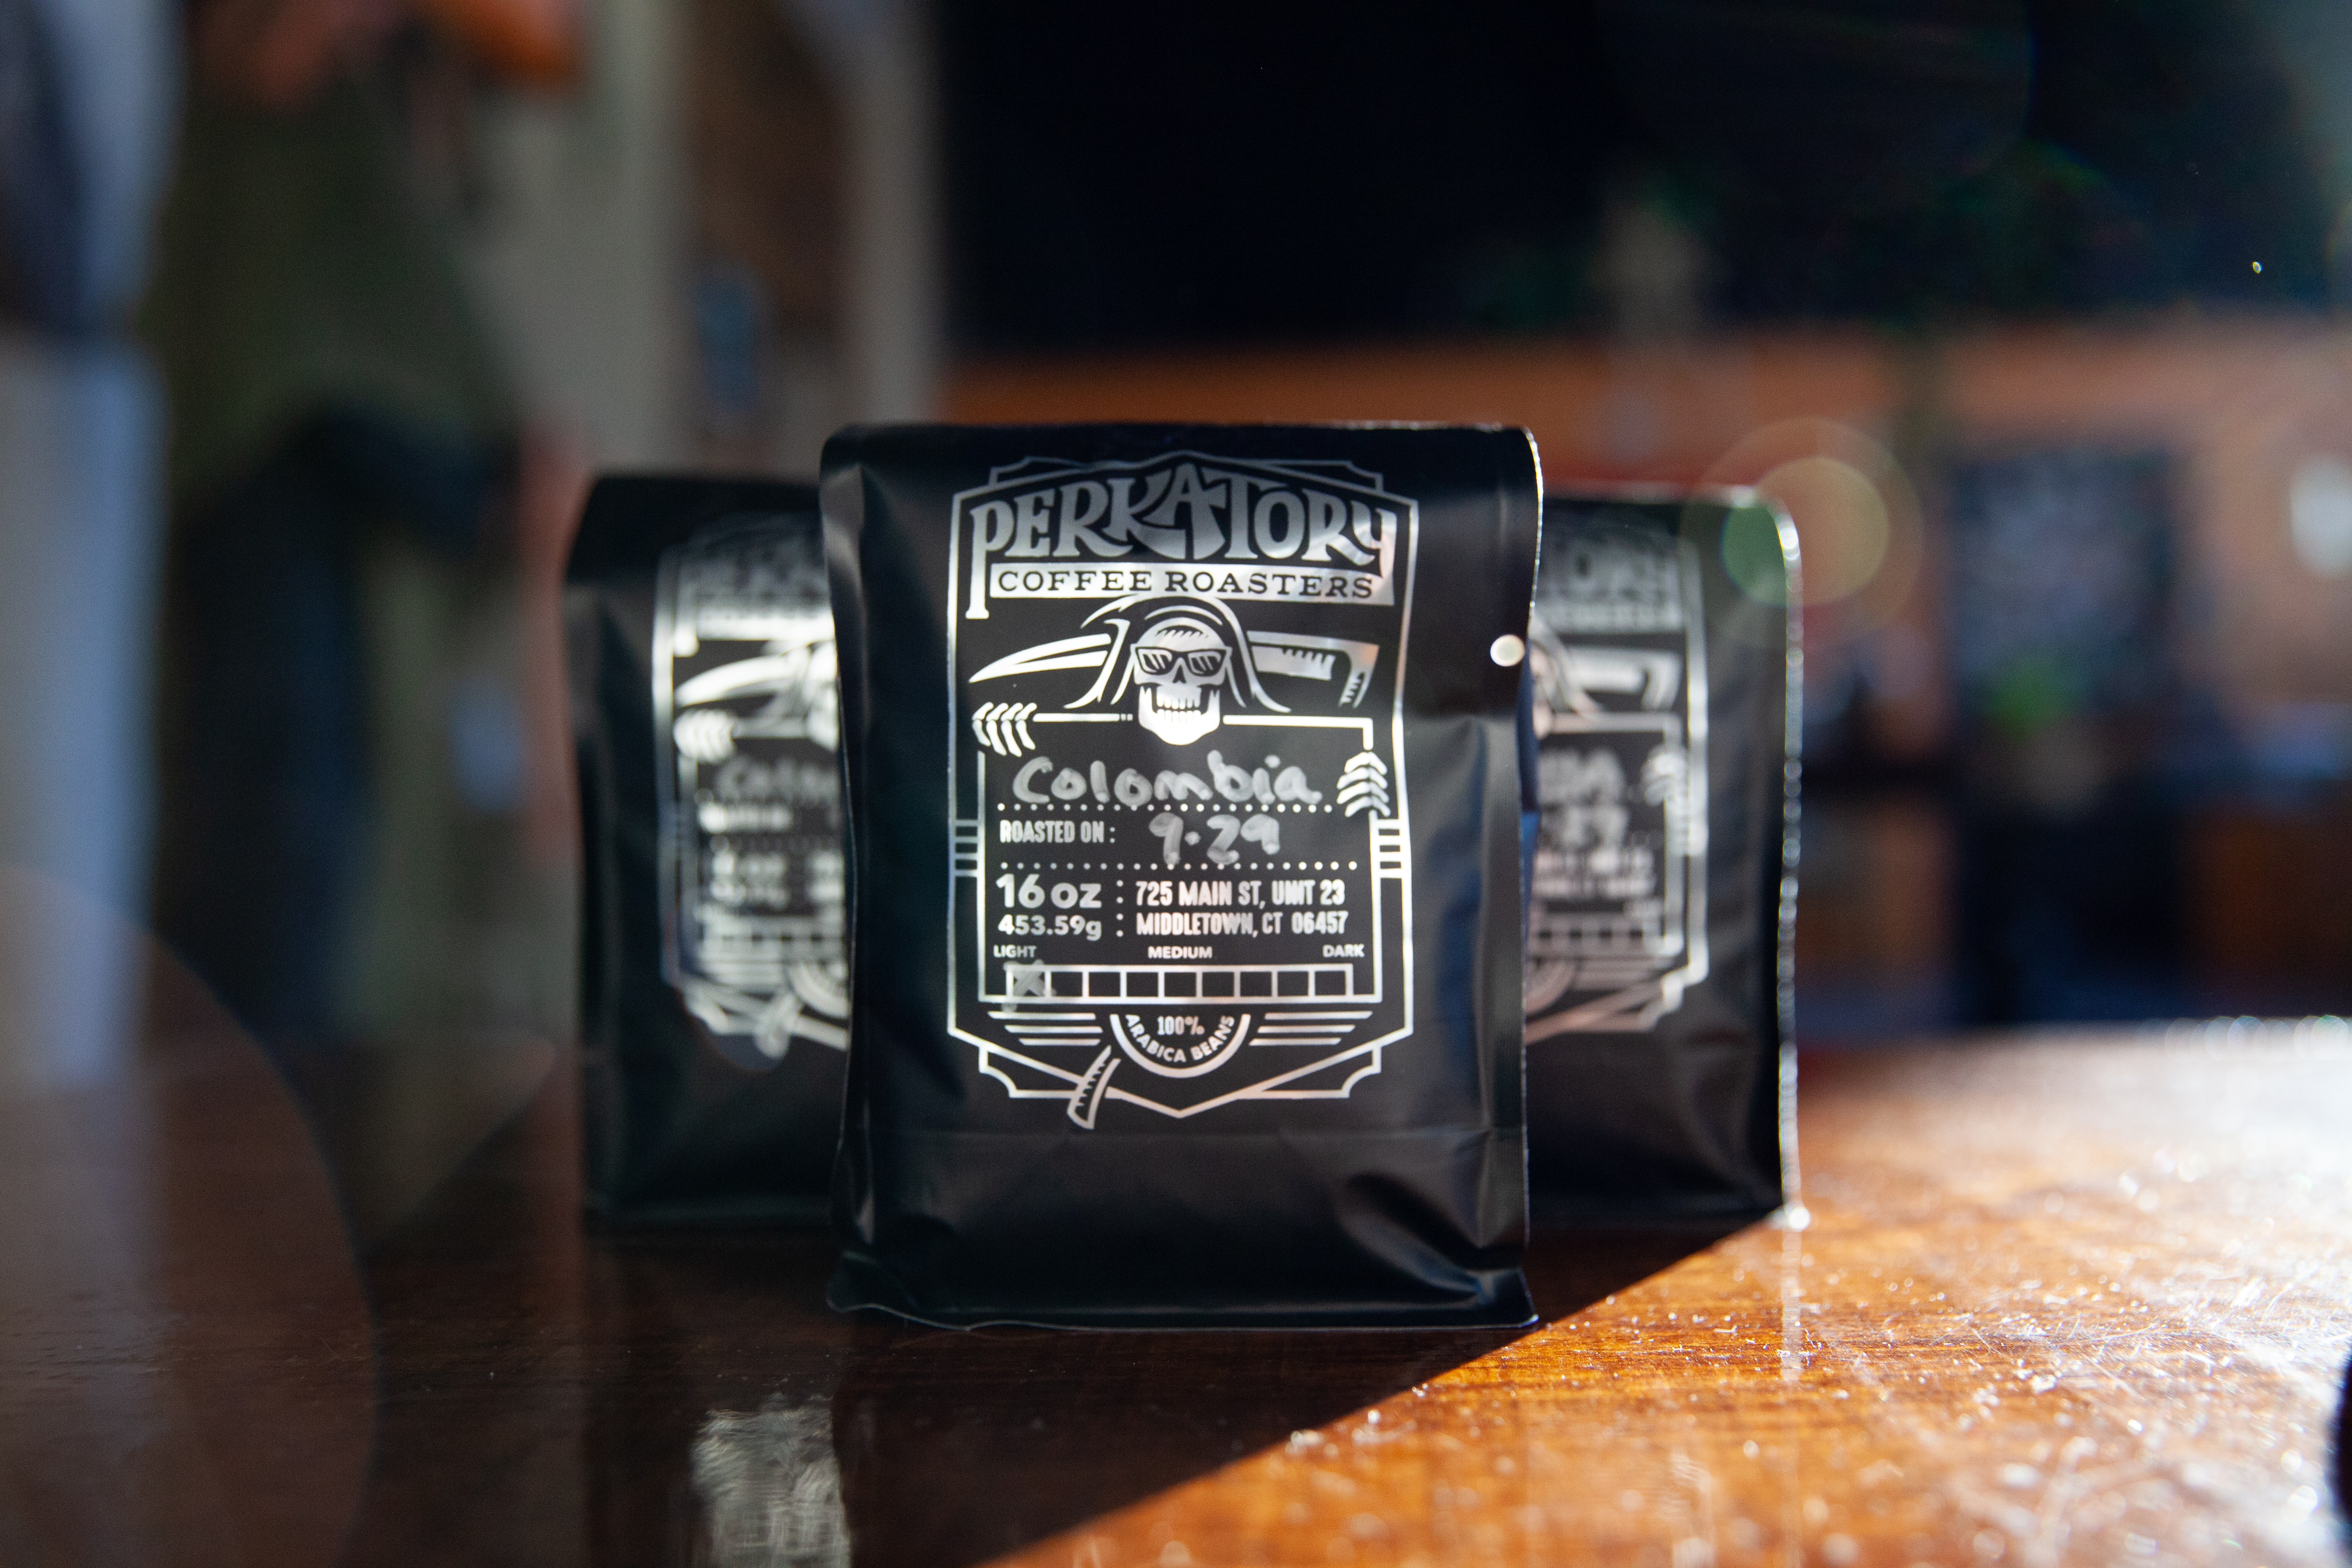 Perkatory Coffee